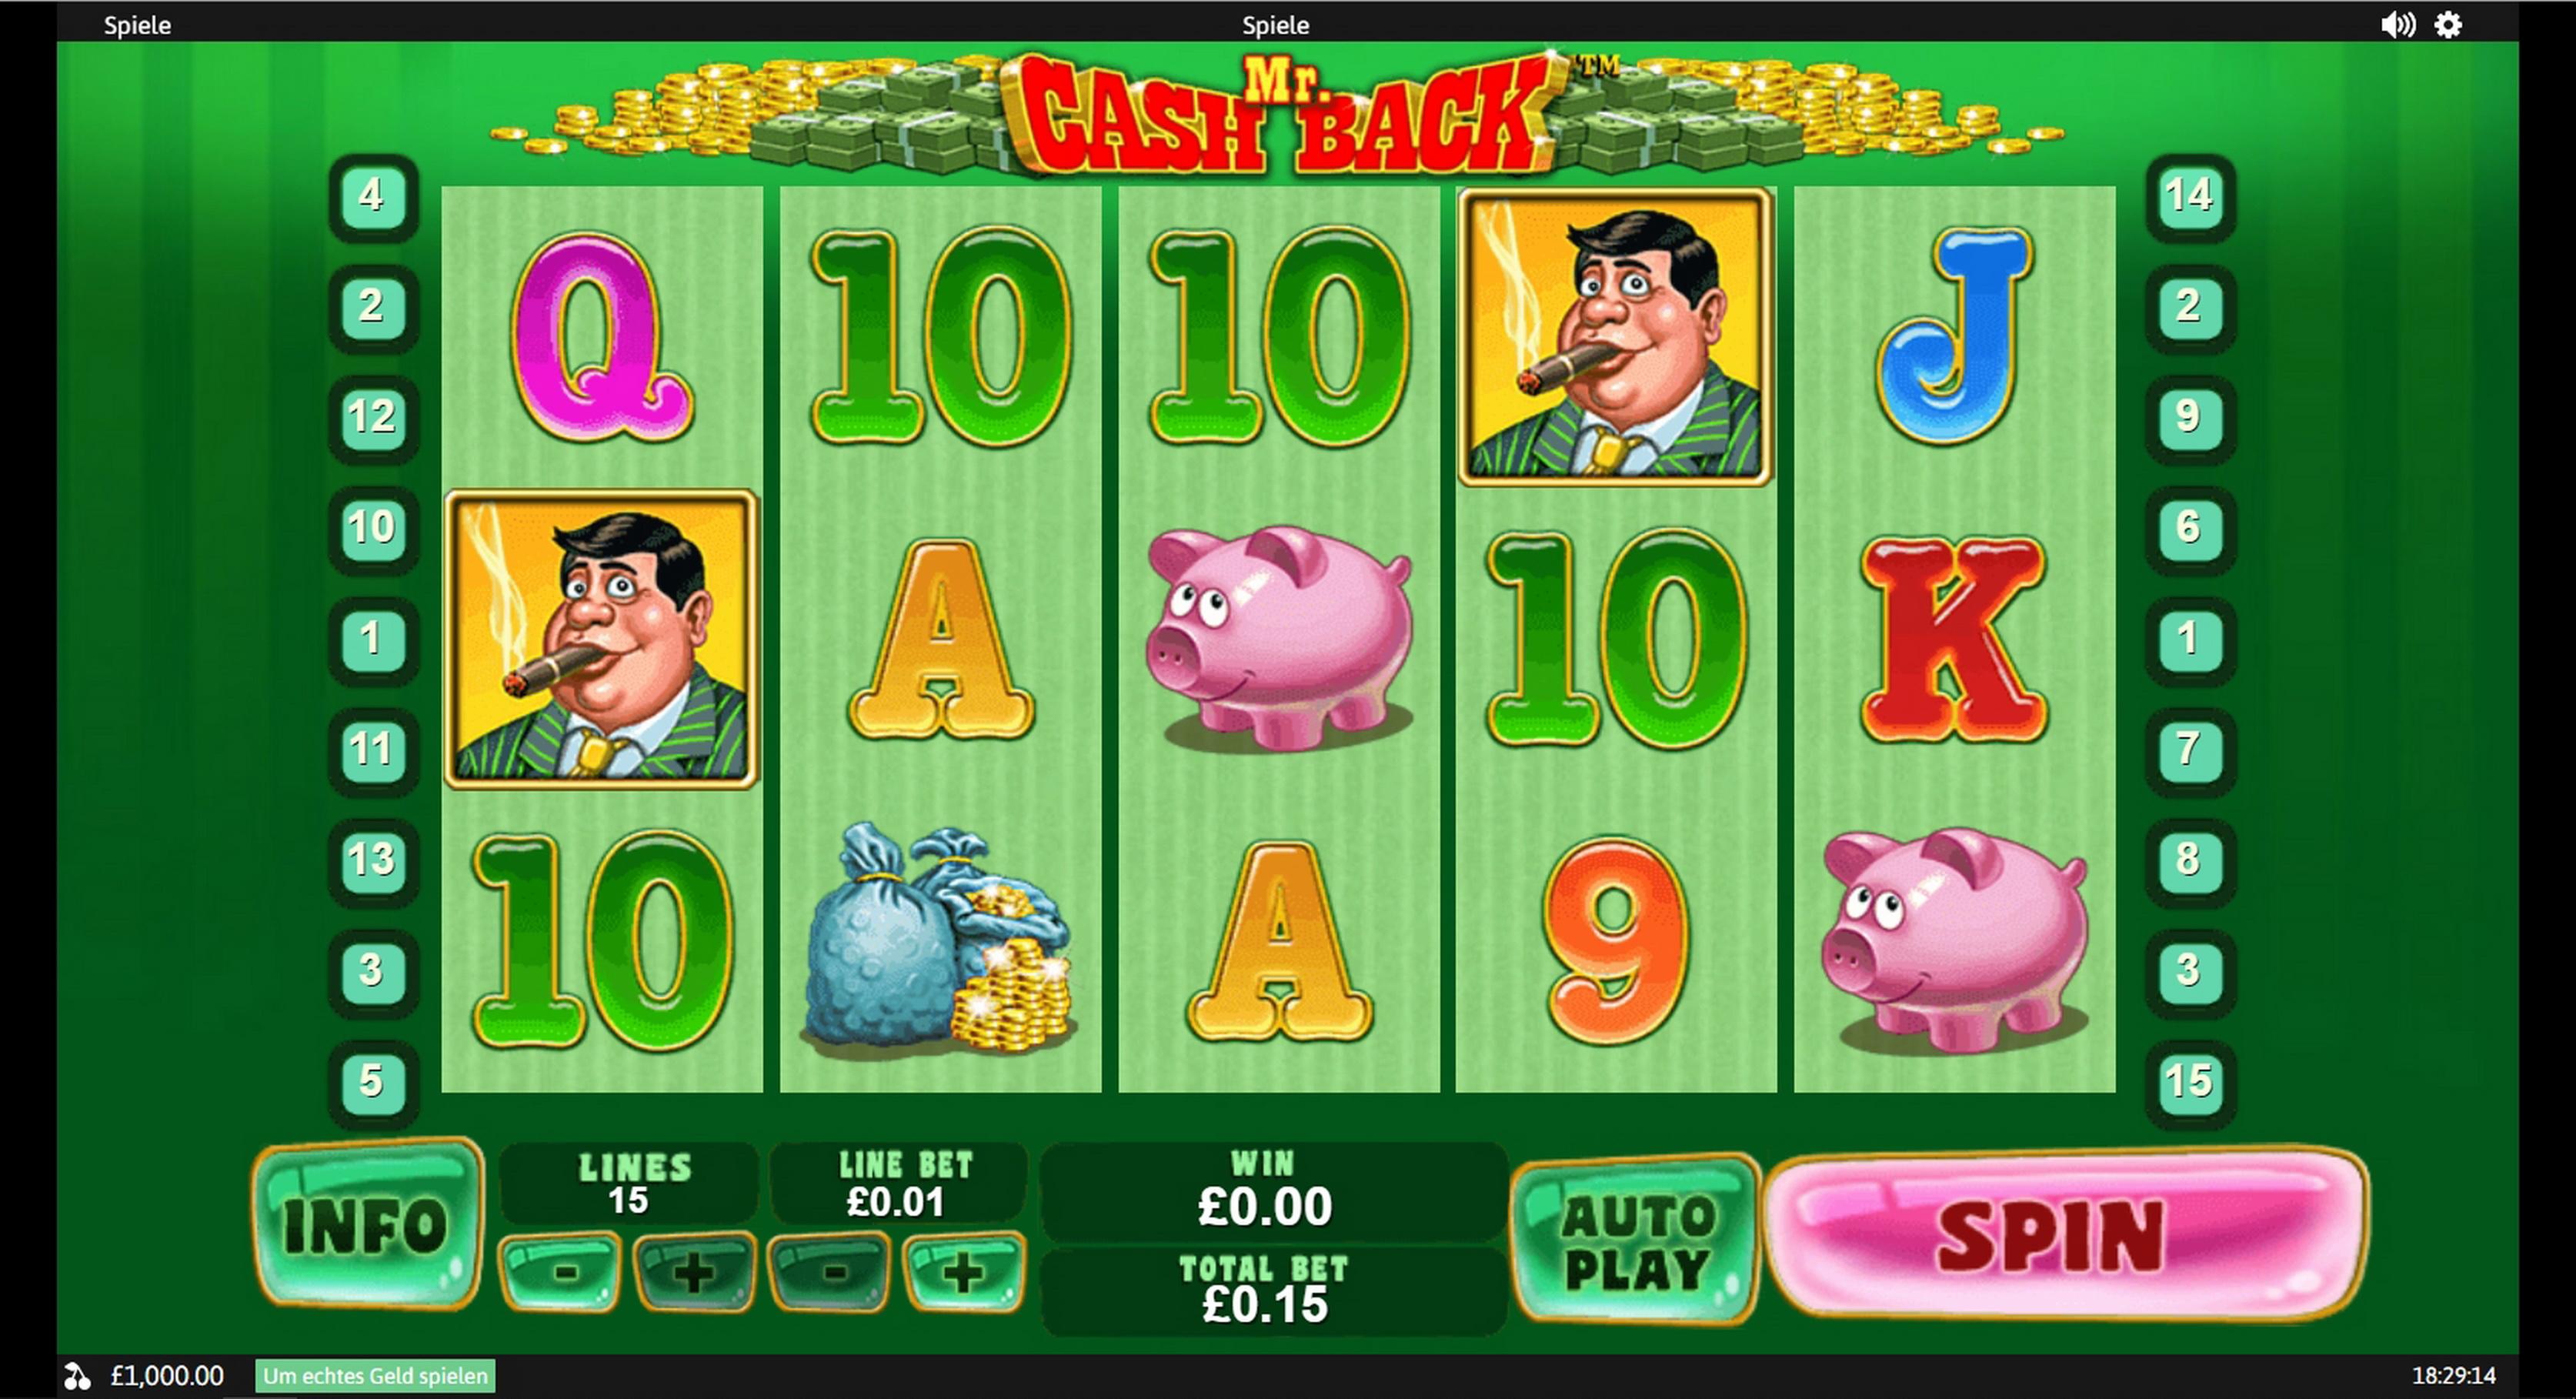 Mr. Cashback Slot Machine